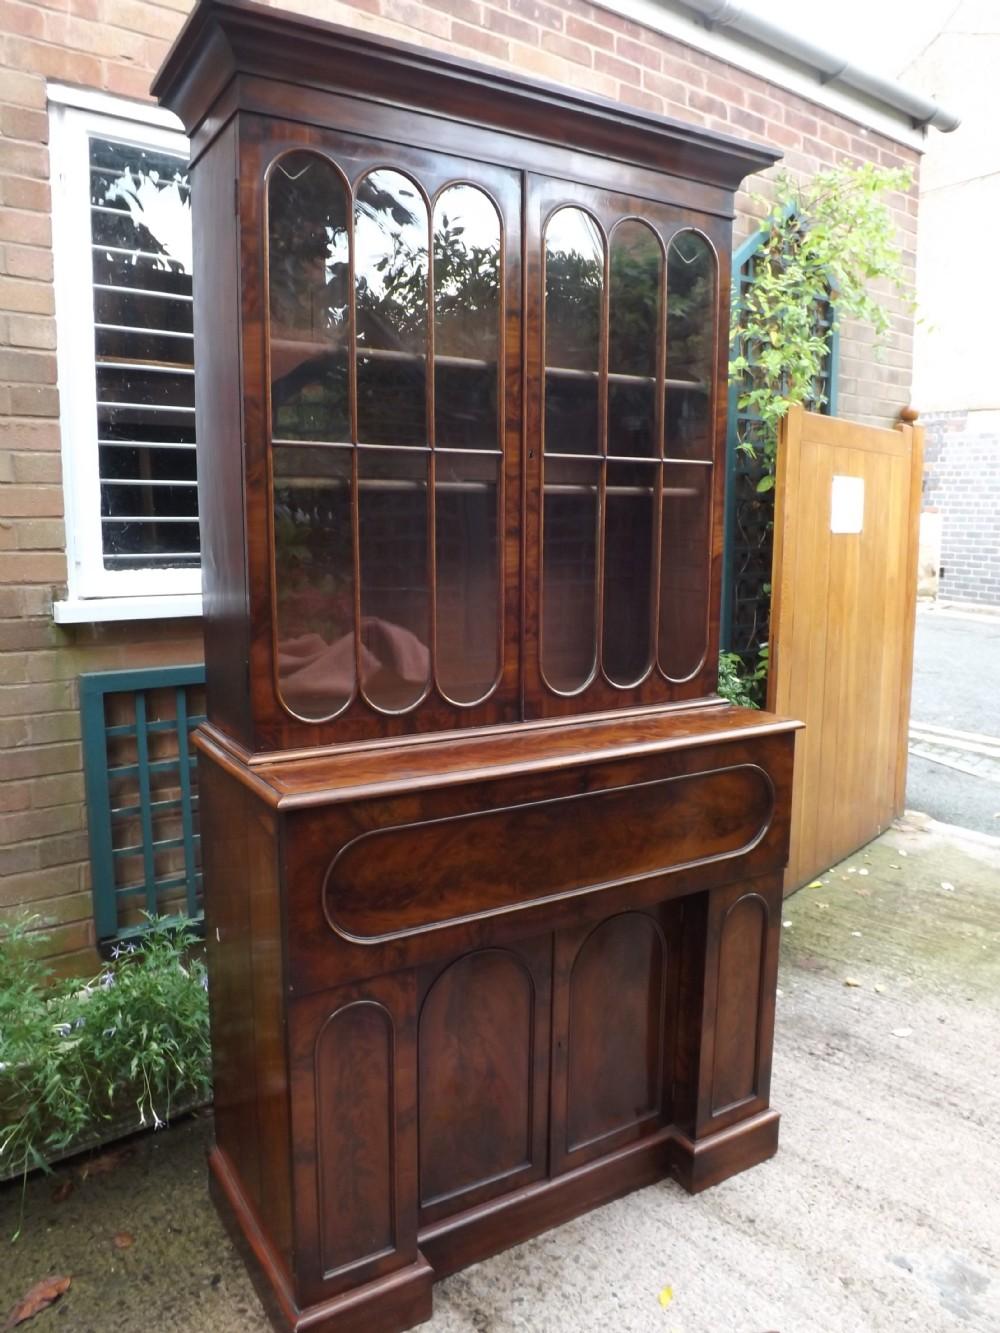 c19th william iv period mahogany library bookcase